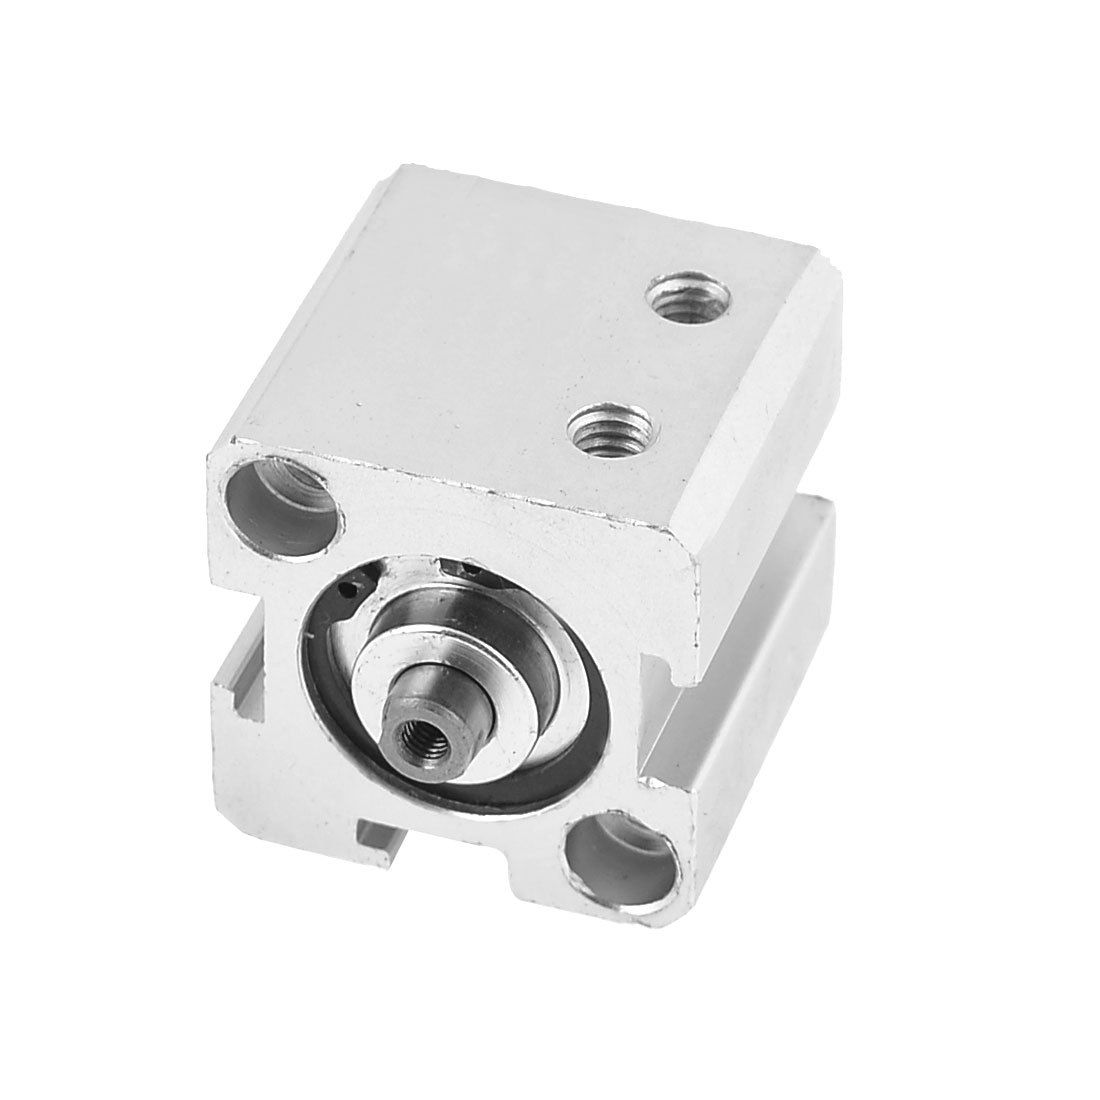 1 Pcs 16mm Bore 40mm Stroke Stainless steel Pneumatic Air Cylinder SDA16-401 Pcs 16mm Bore 40mm Stroke Stainless steel Pneumatic Air Cylinder SDA16-40